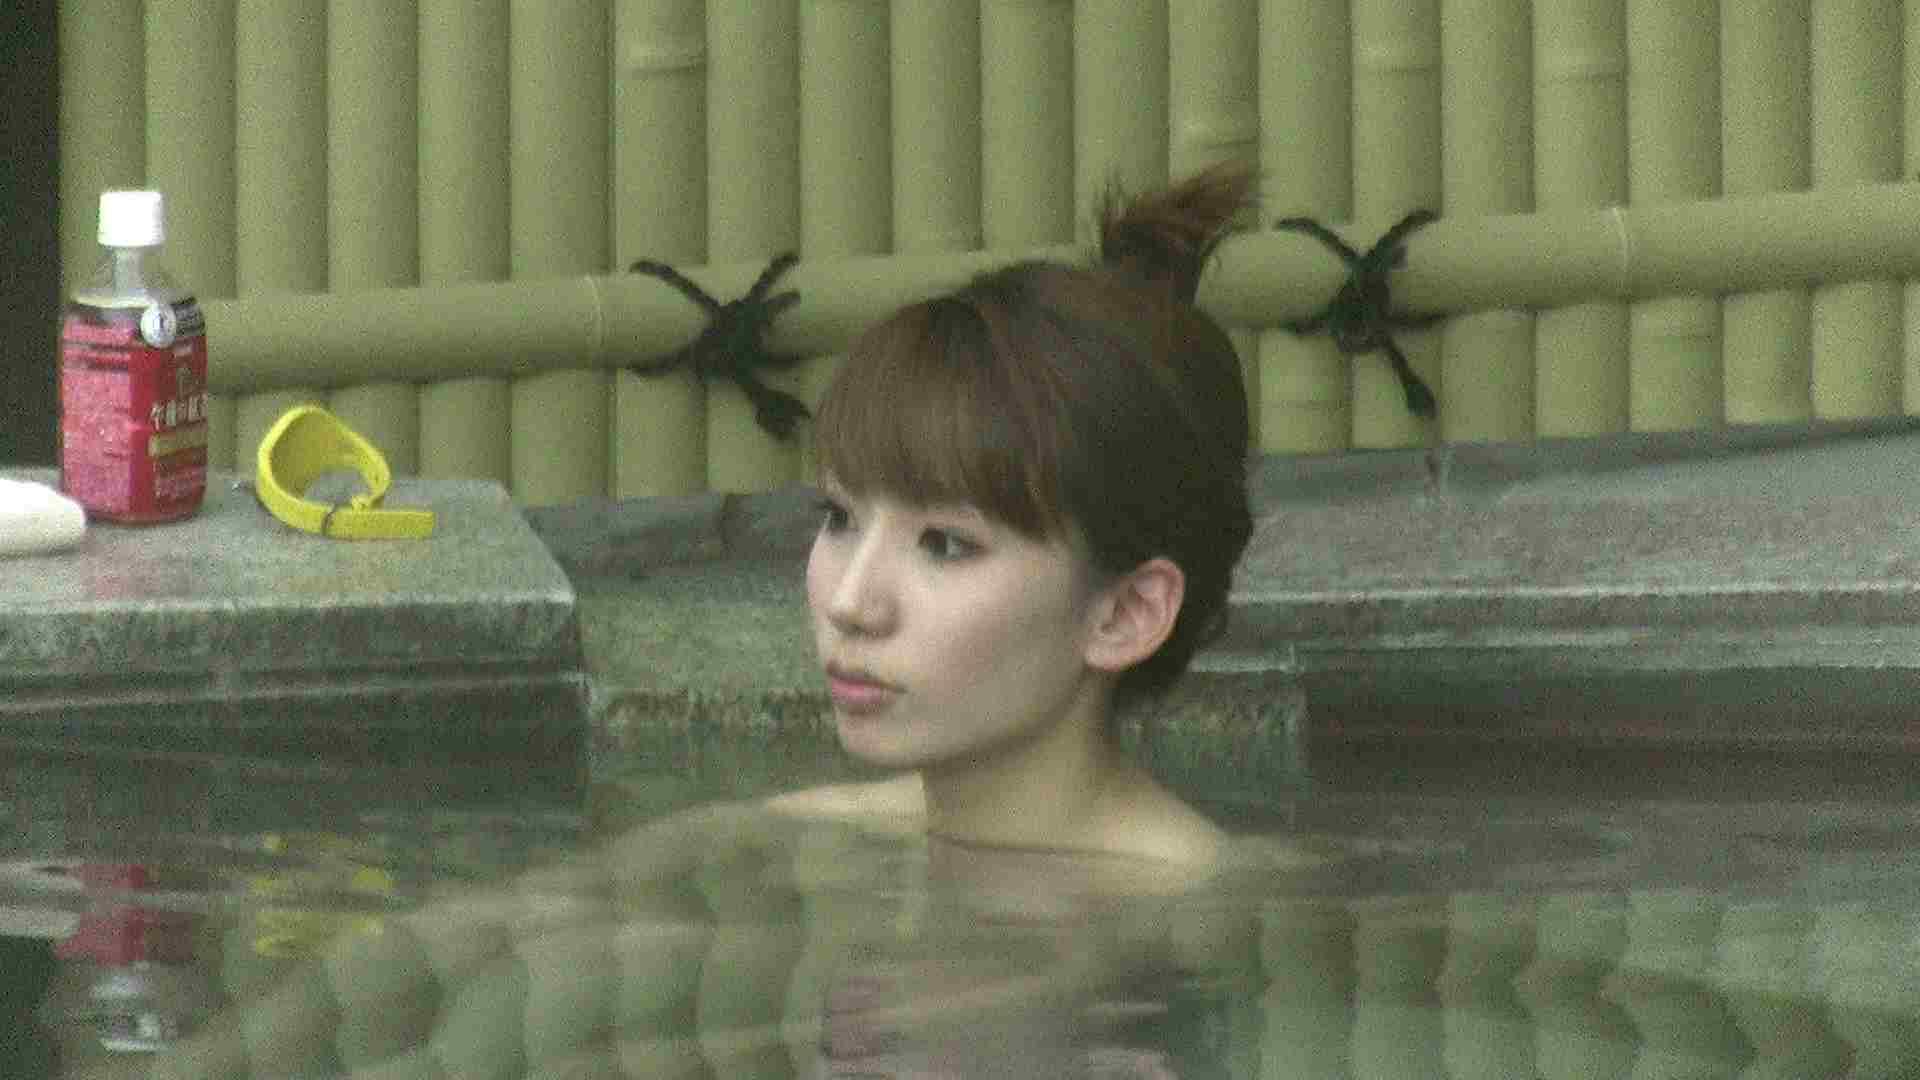 Aquaな露天風呂Vol.208 露天風呂編  103PIX 36